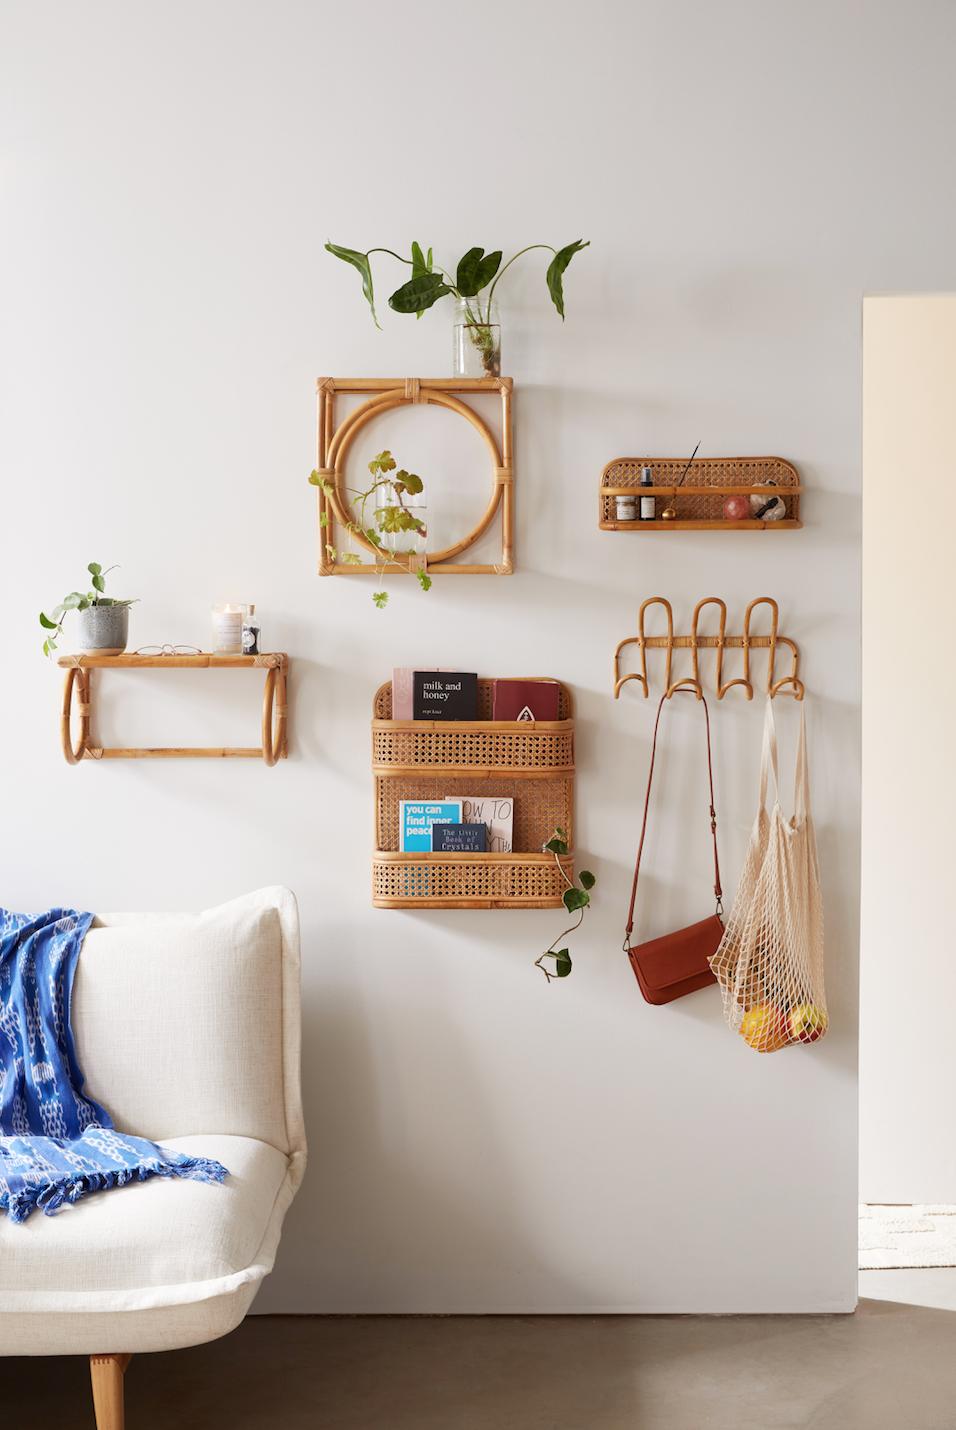 Uohome Urban Outfitters Home Home Decor Home Decor Inspiration